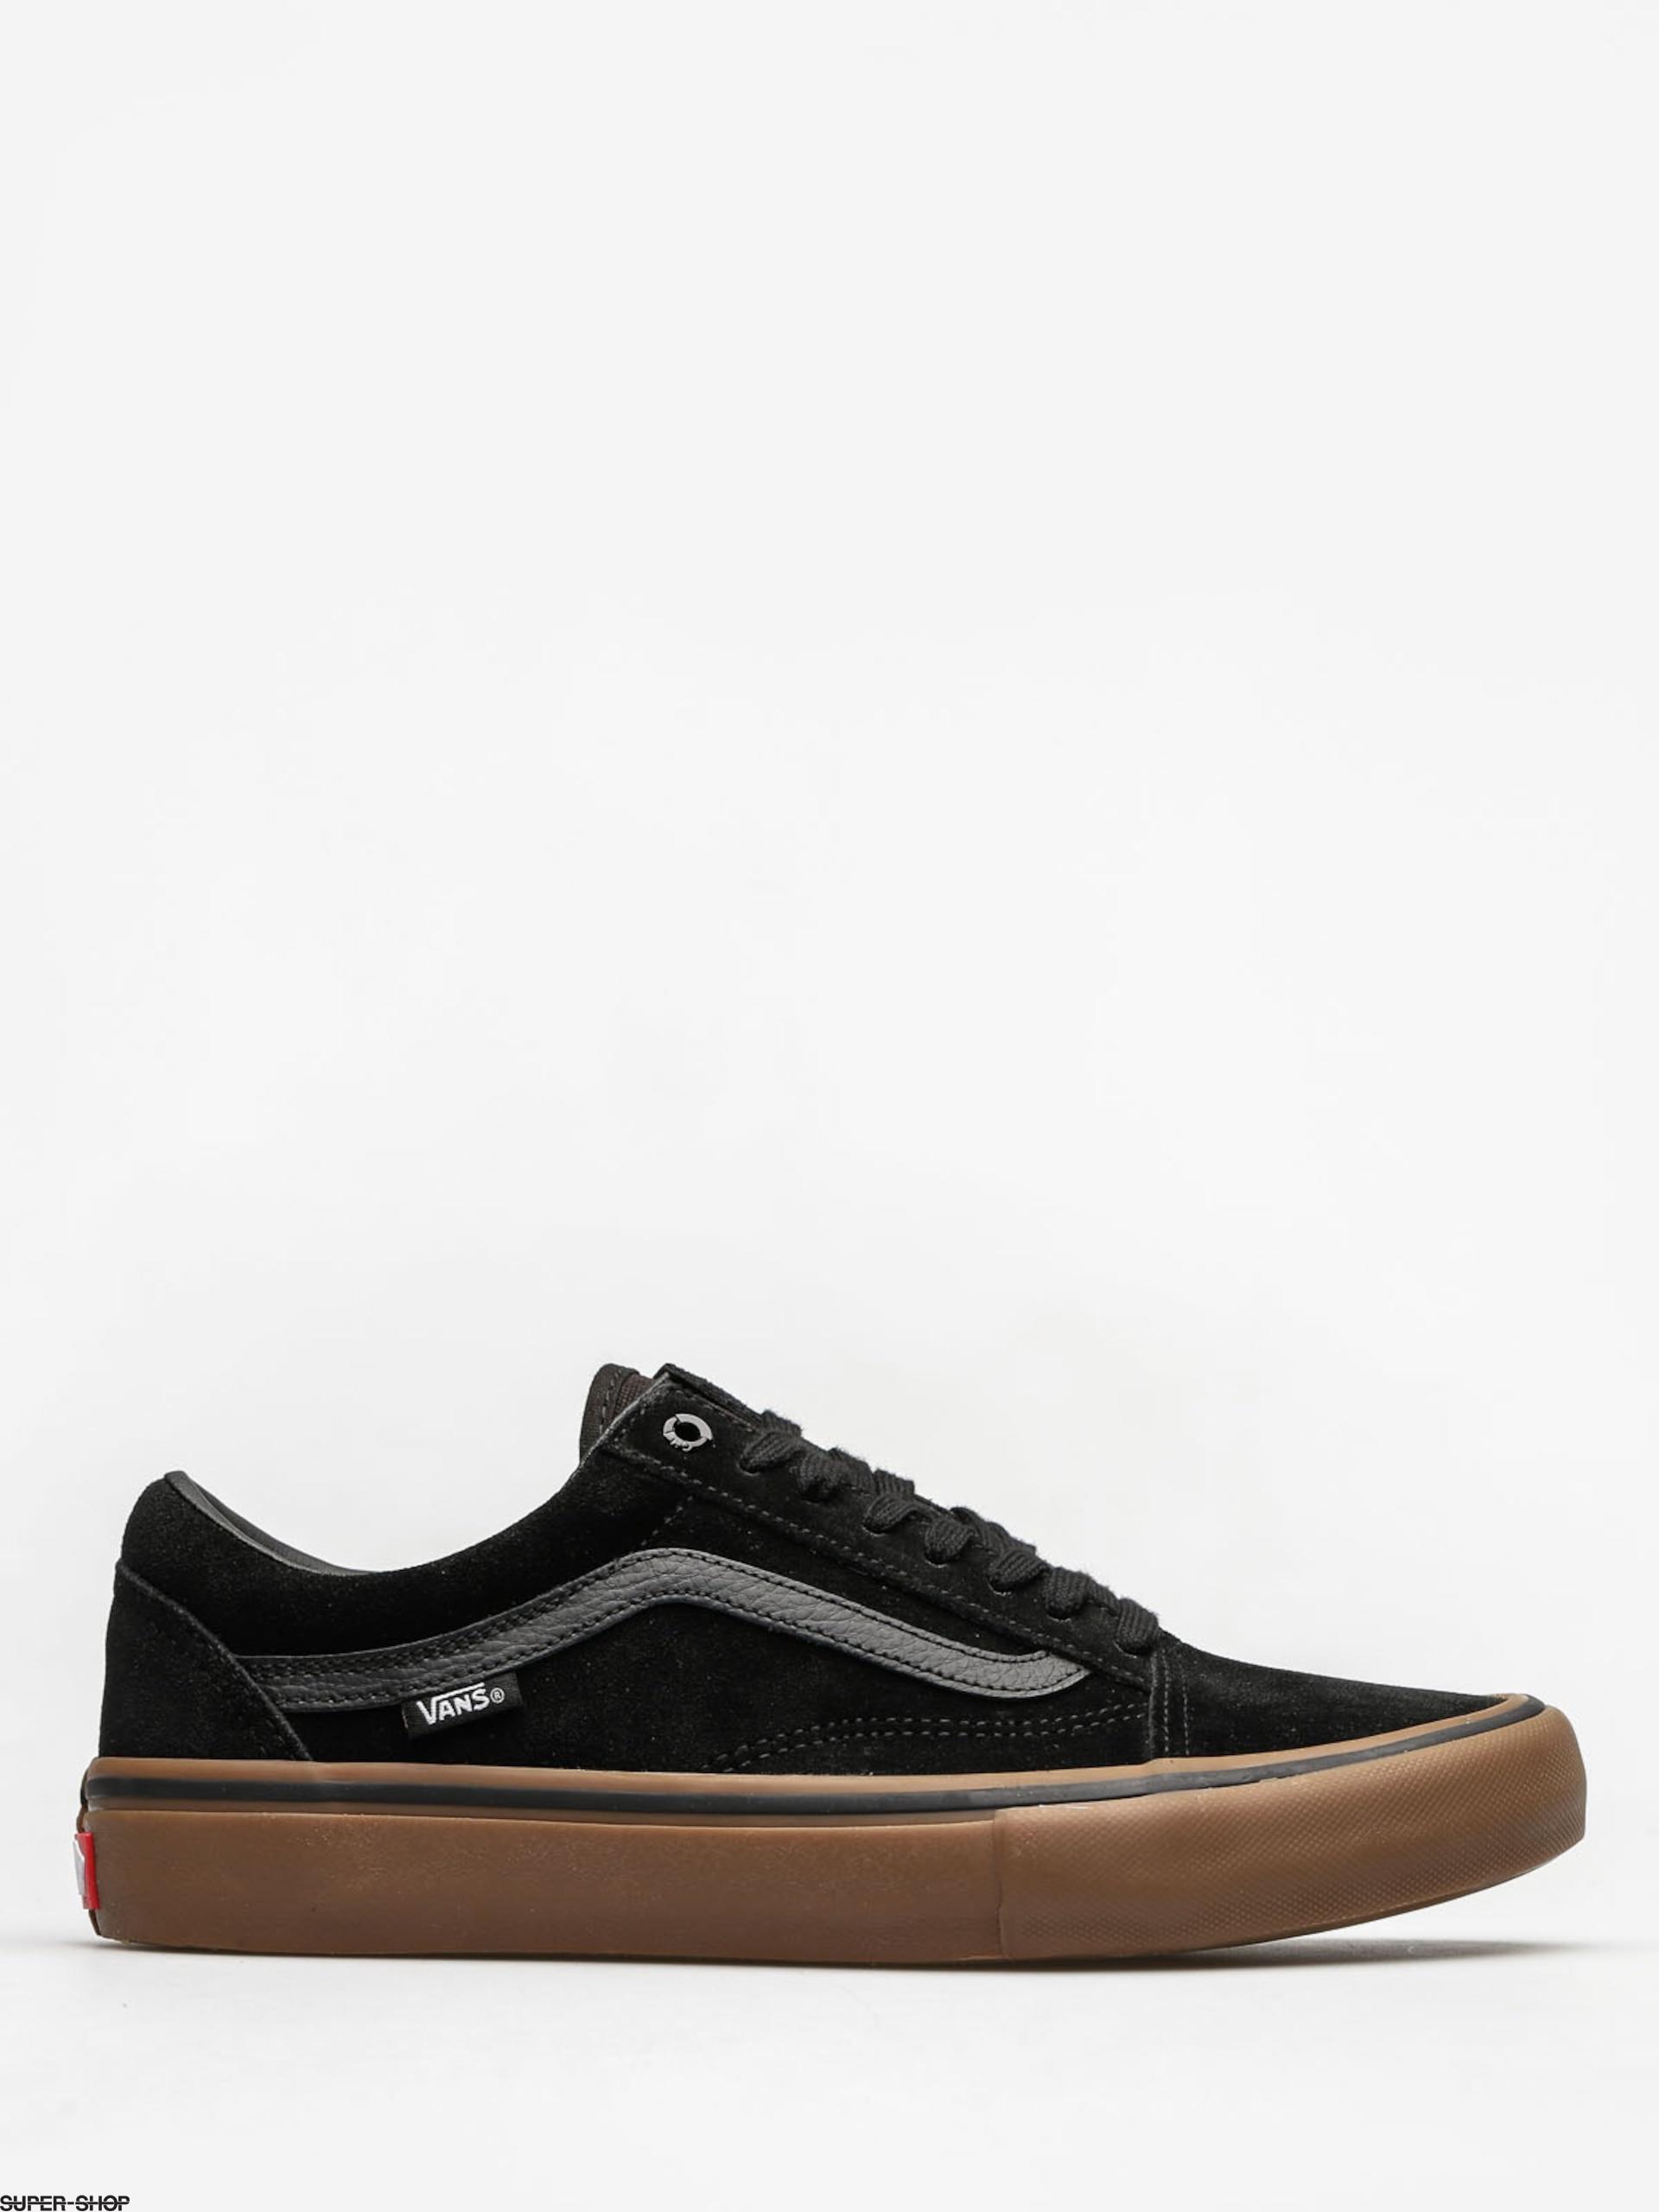 Vans Shoes Old Skool Pro (black/gum/gum)